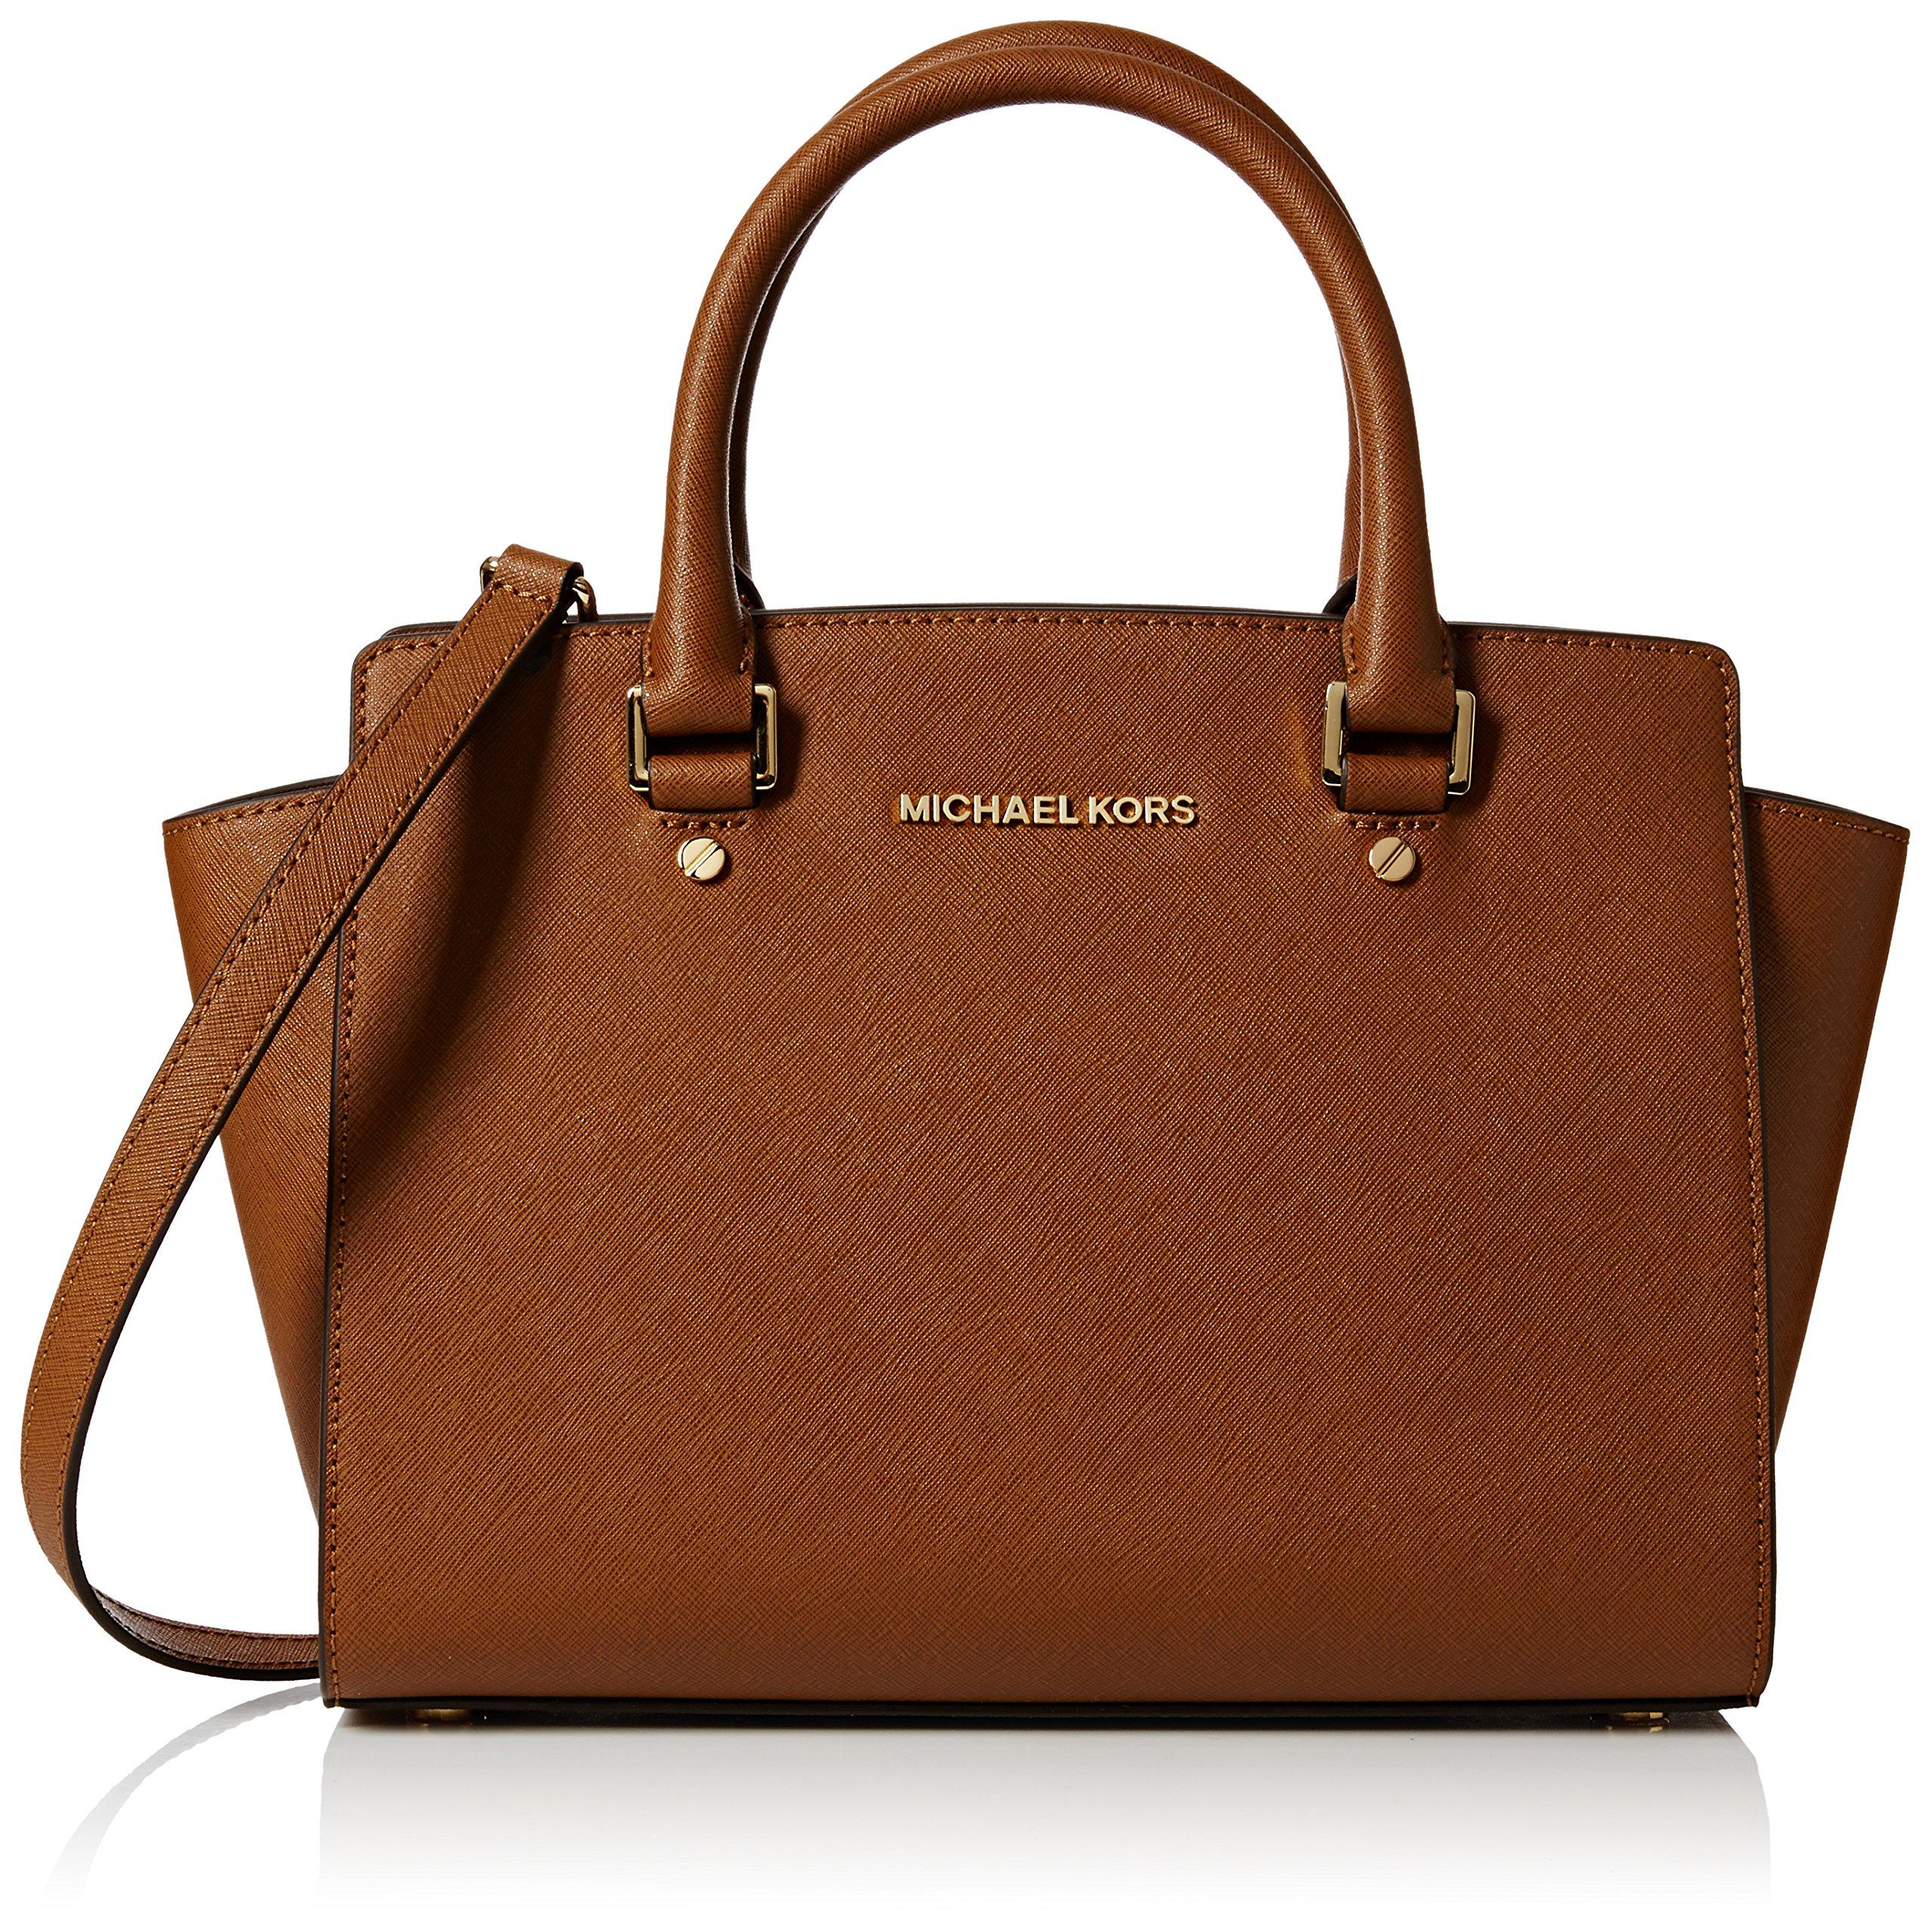 5e8203ace721 MICHAEL Michael Kors Women's Selma Medium Trapeze Satchel, Luggage, One Size